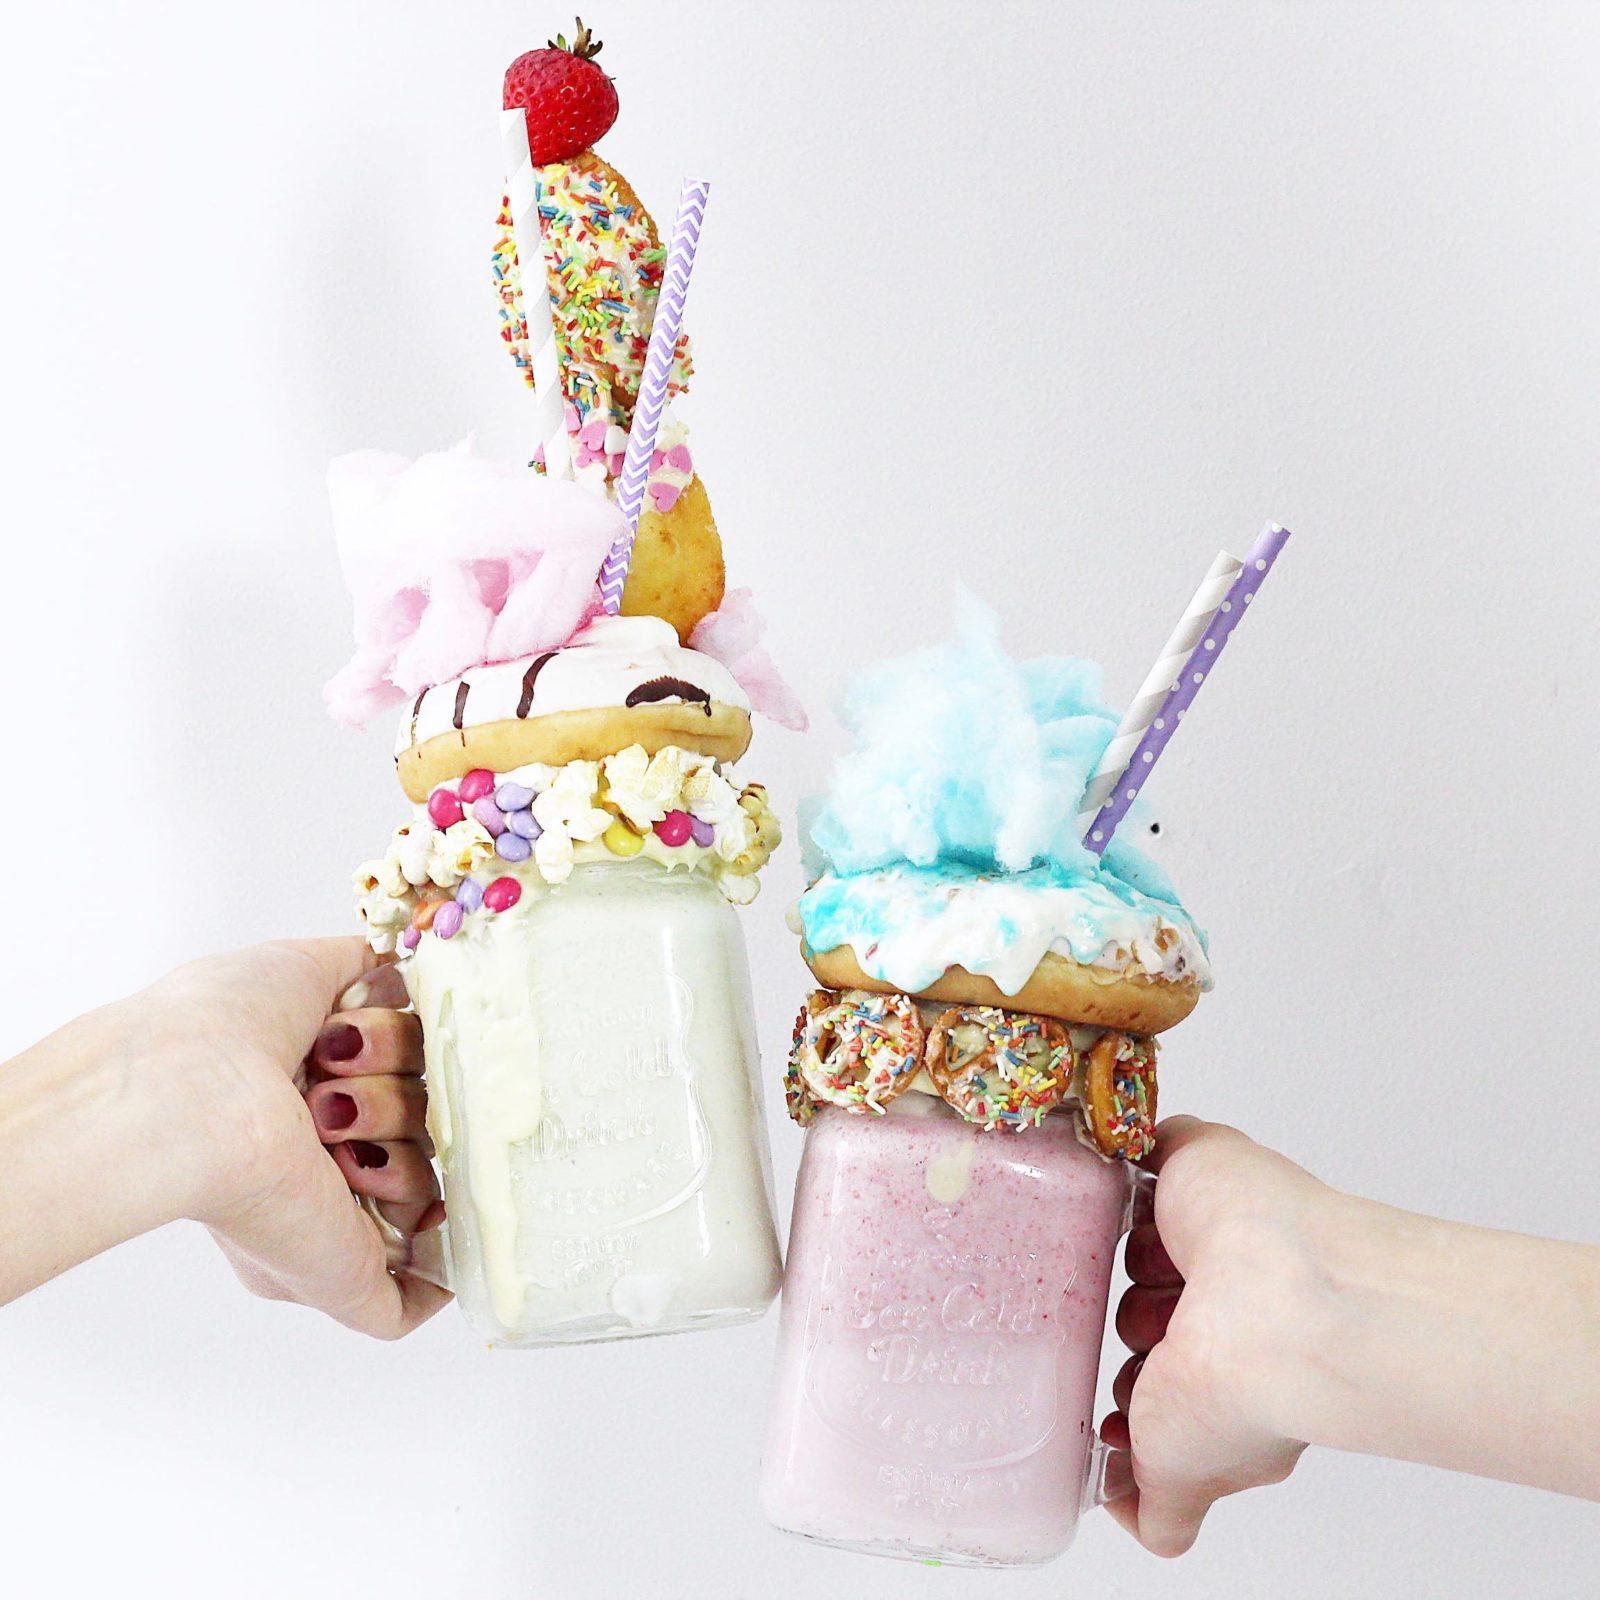 freakshakes-milch-shakes-rezept-donuts-diy-blog-berlin